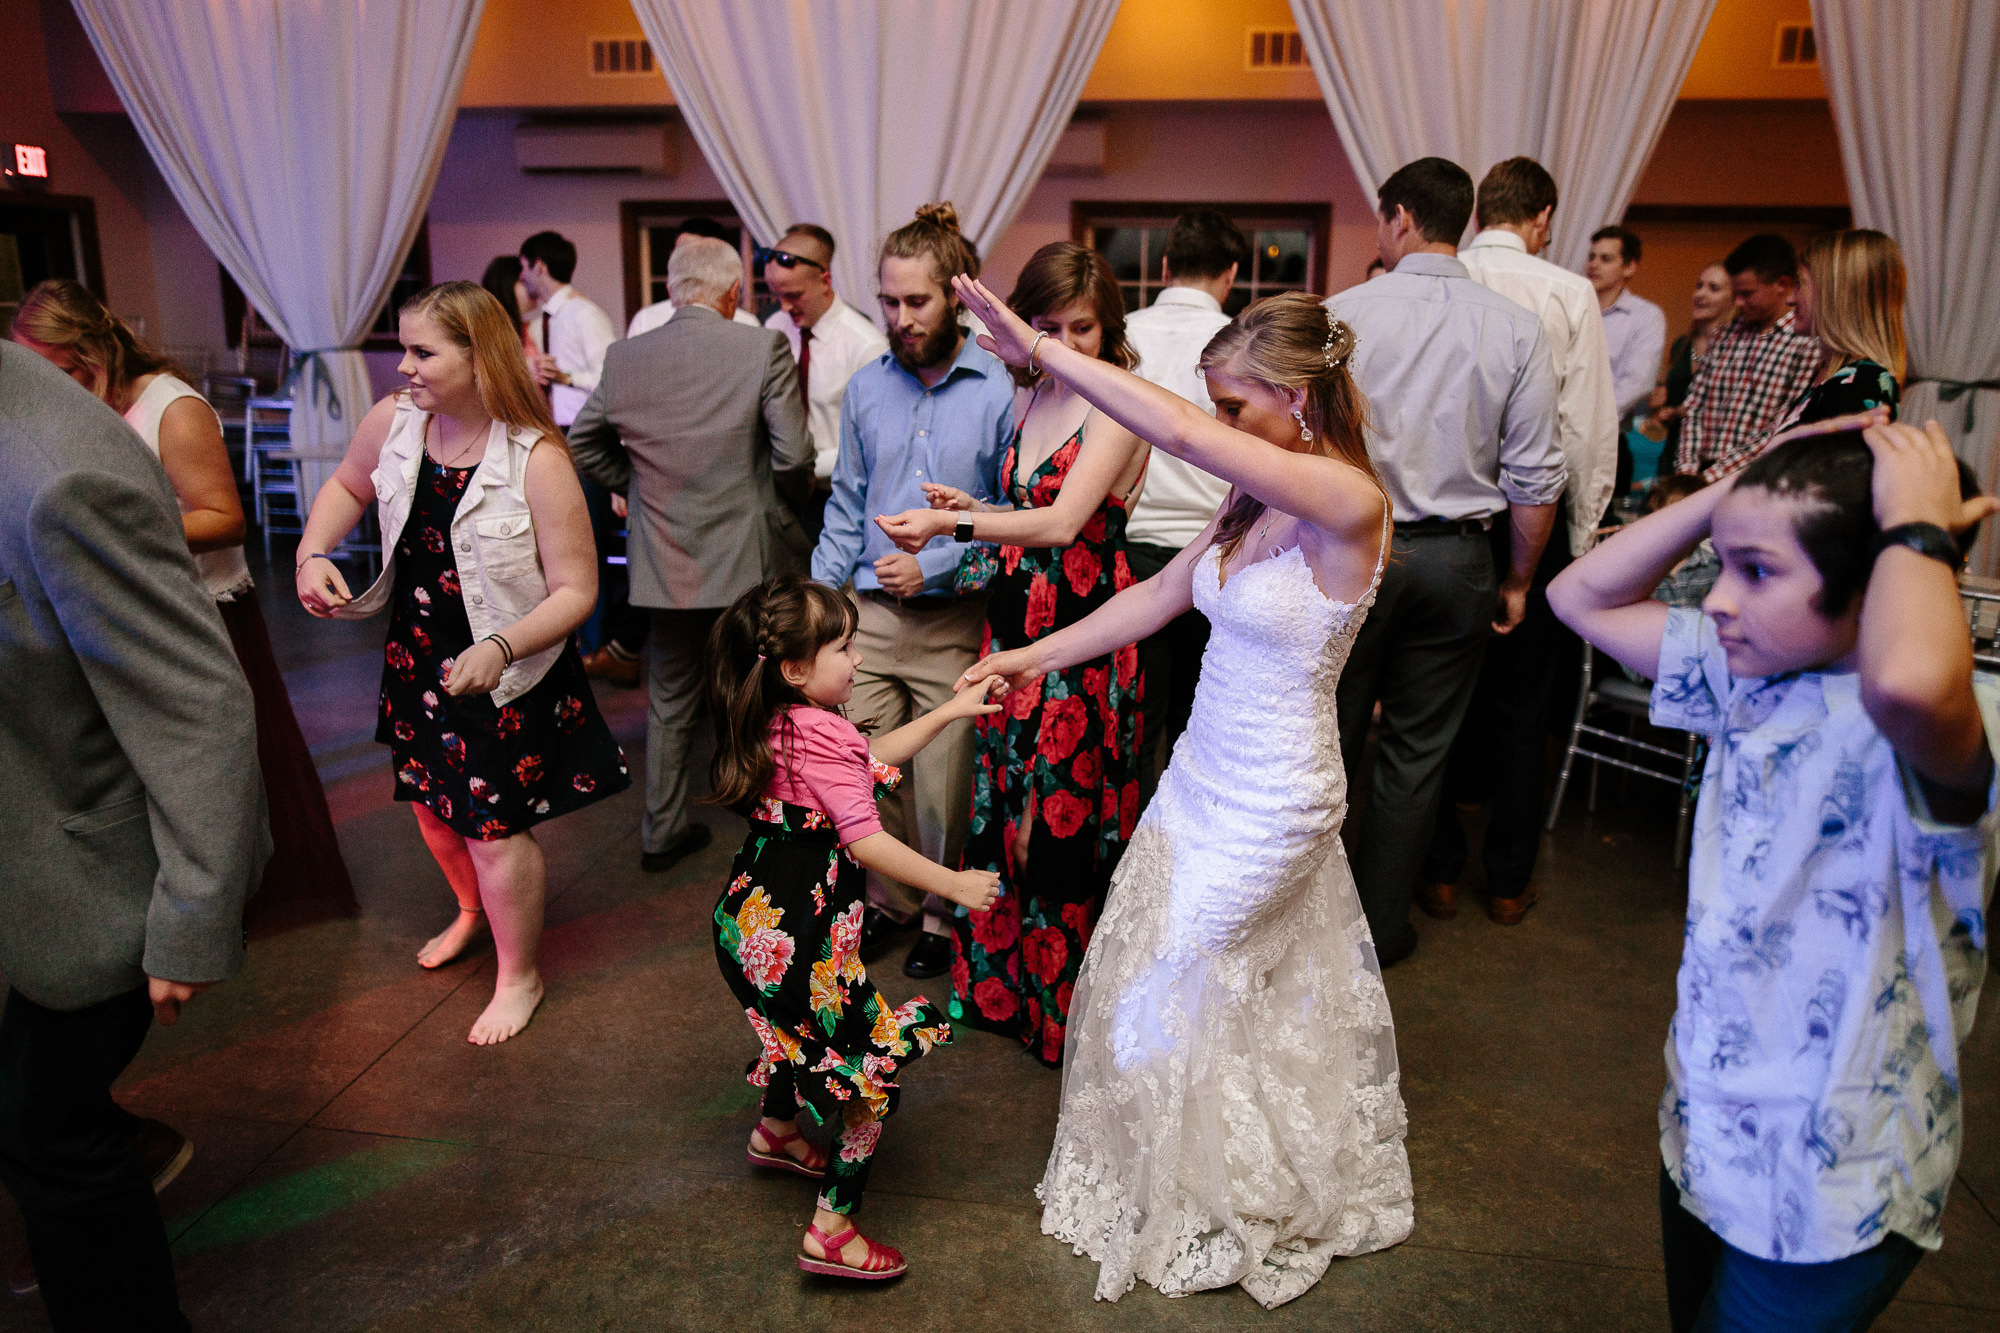 wedding-elopement-adventerous-romantic-timeless-south-dakota-blue-haven-barn-114.jpg